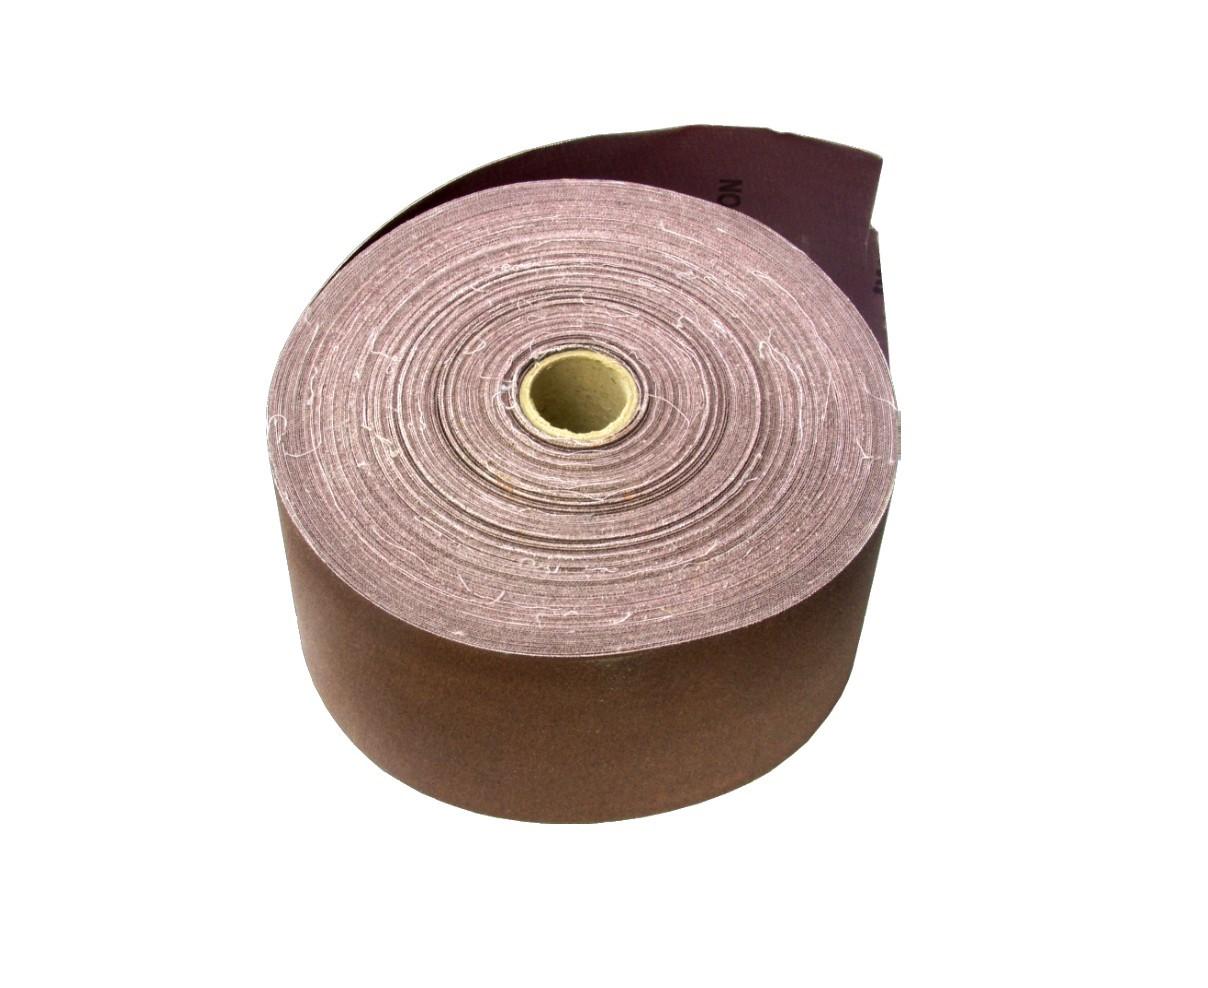 Smirghel Universal pe Suport Textil ETS Lungime 50m, Latime 100mm, Granulatie 240 imagine techstar.ro 2021